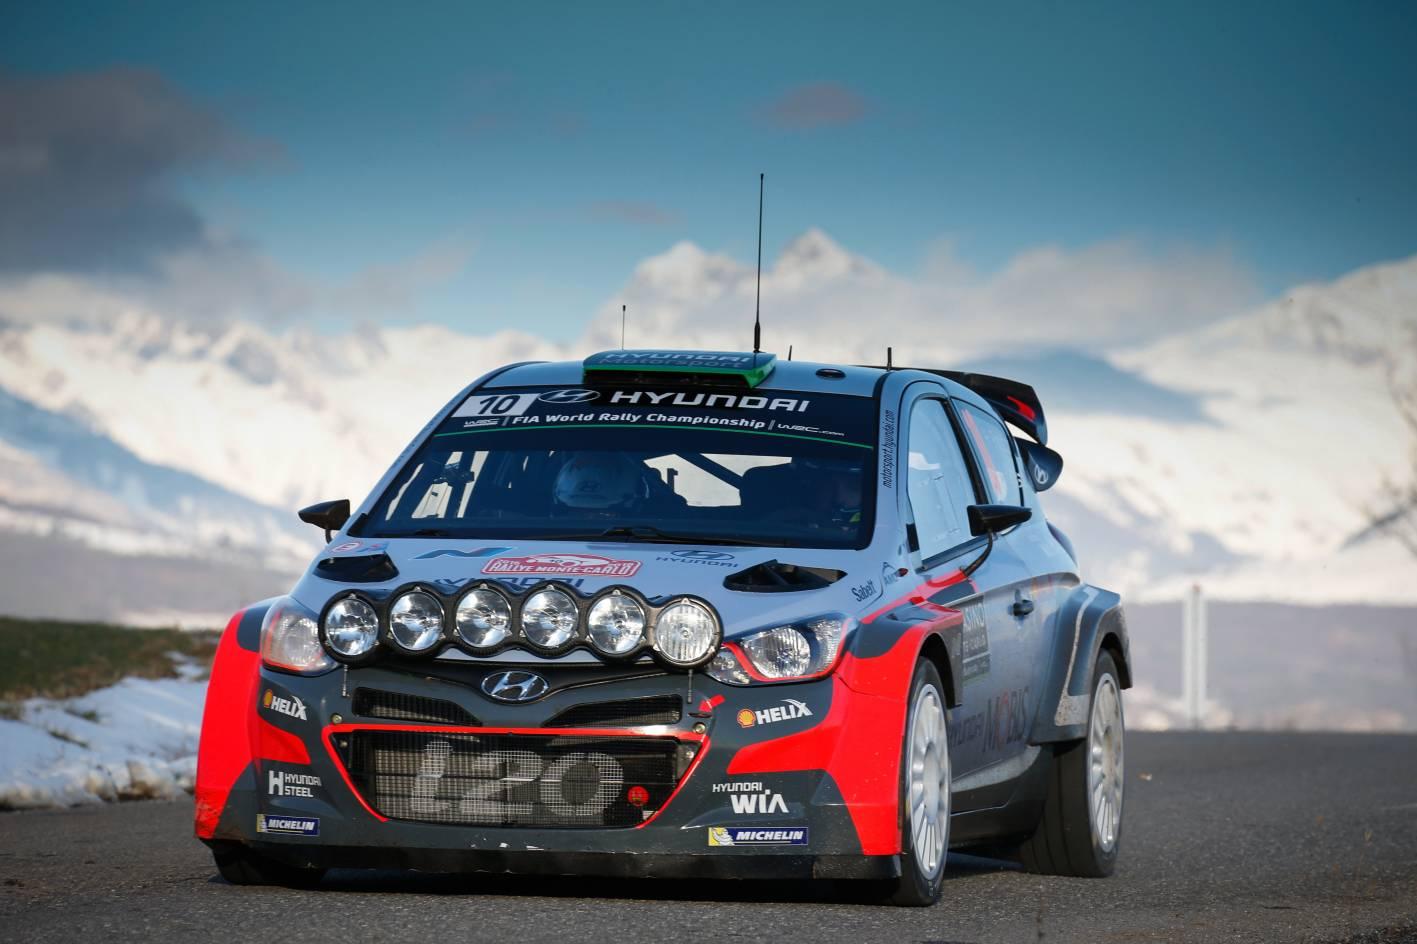 Hyundai I20 Wrc Secures First Podium Finish At 2016 Wrc